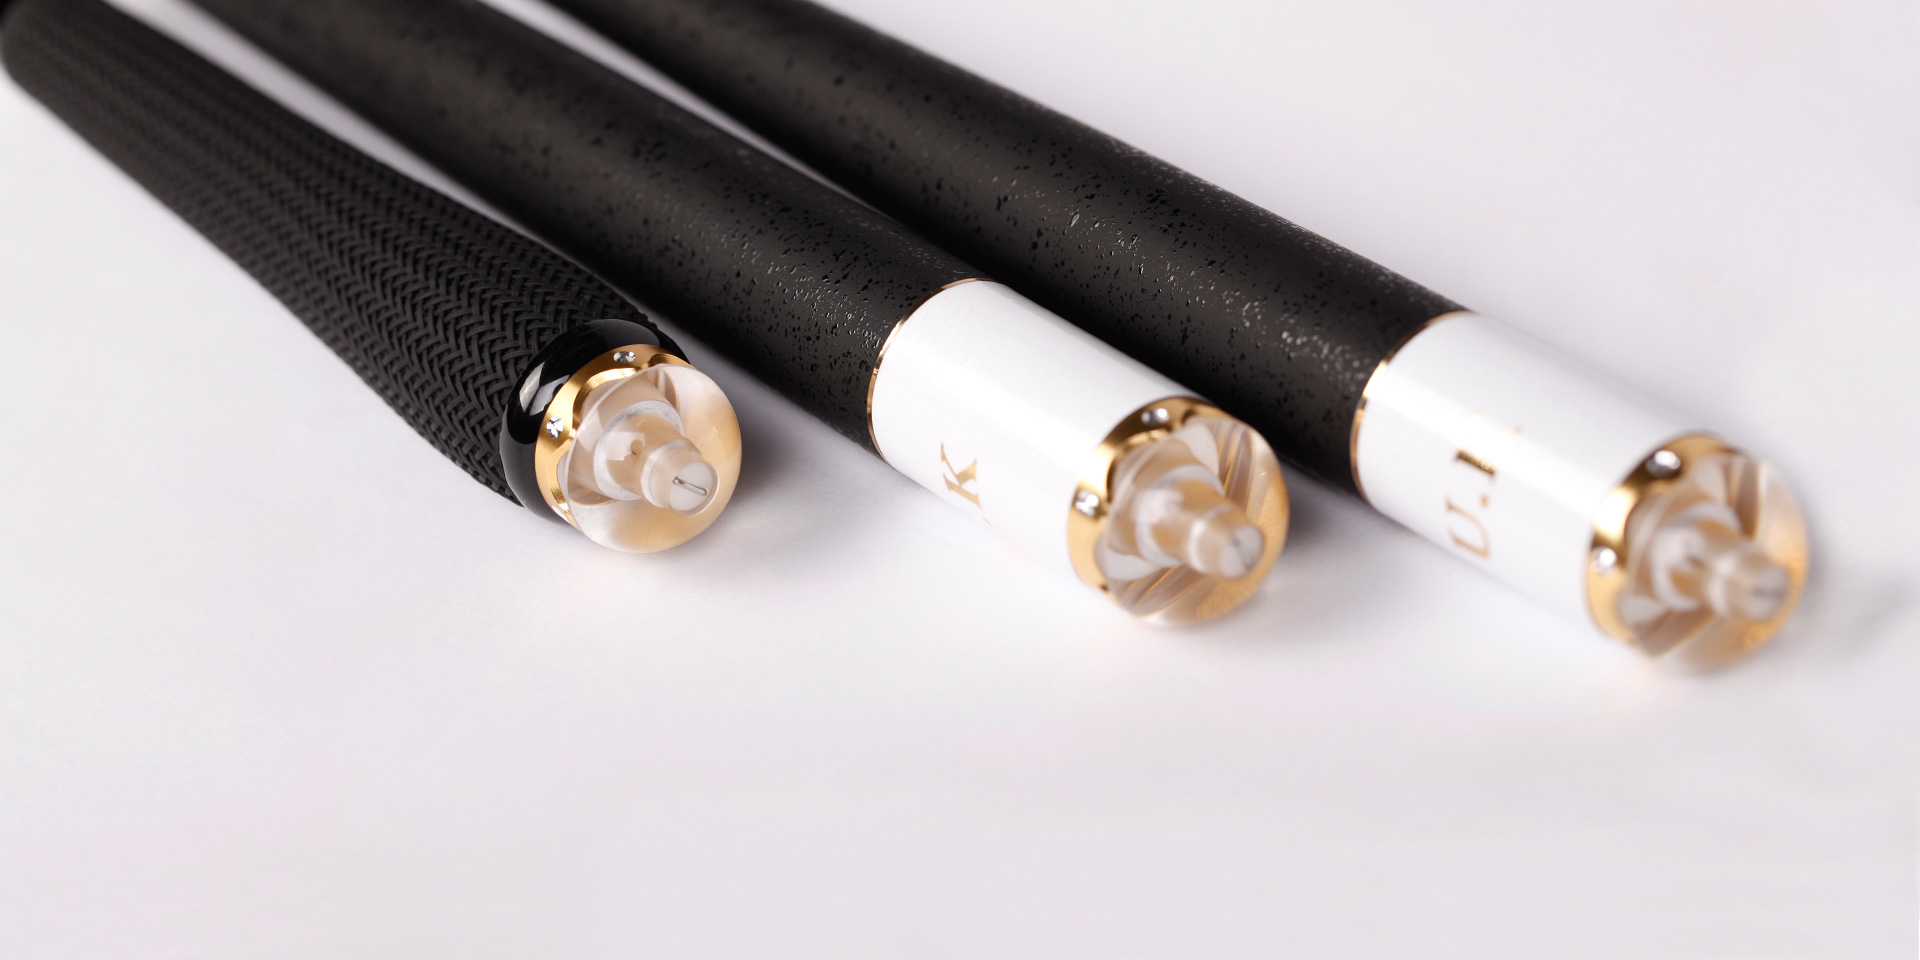 2.7m,3.0m配黑色橡胶防滑式葫芦型手把,简洁大方,手感优秀<br />3.6m,3.9m,4.5m配黑色特制起凸防滑式手把,握感扎实易于控竿施钓